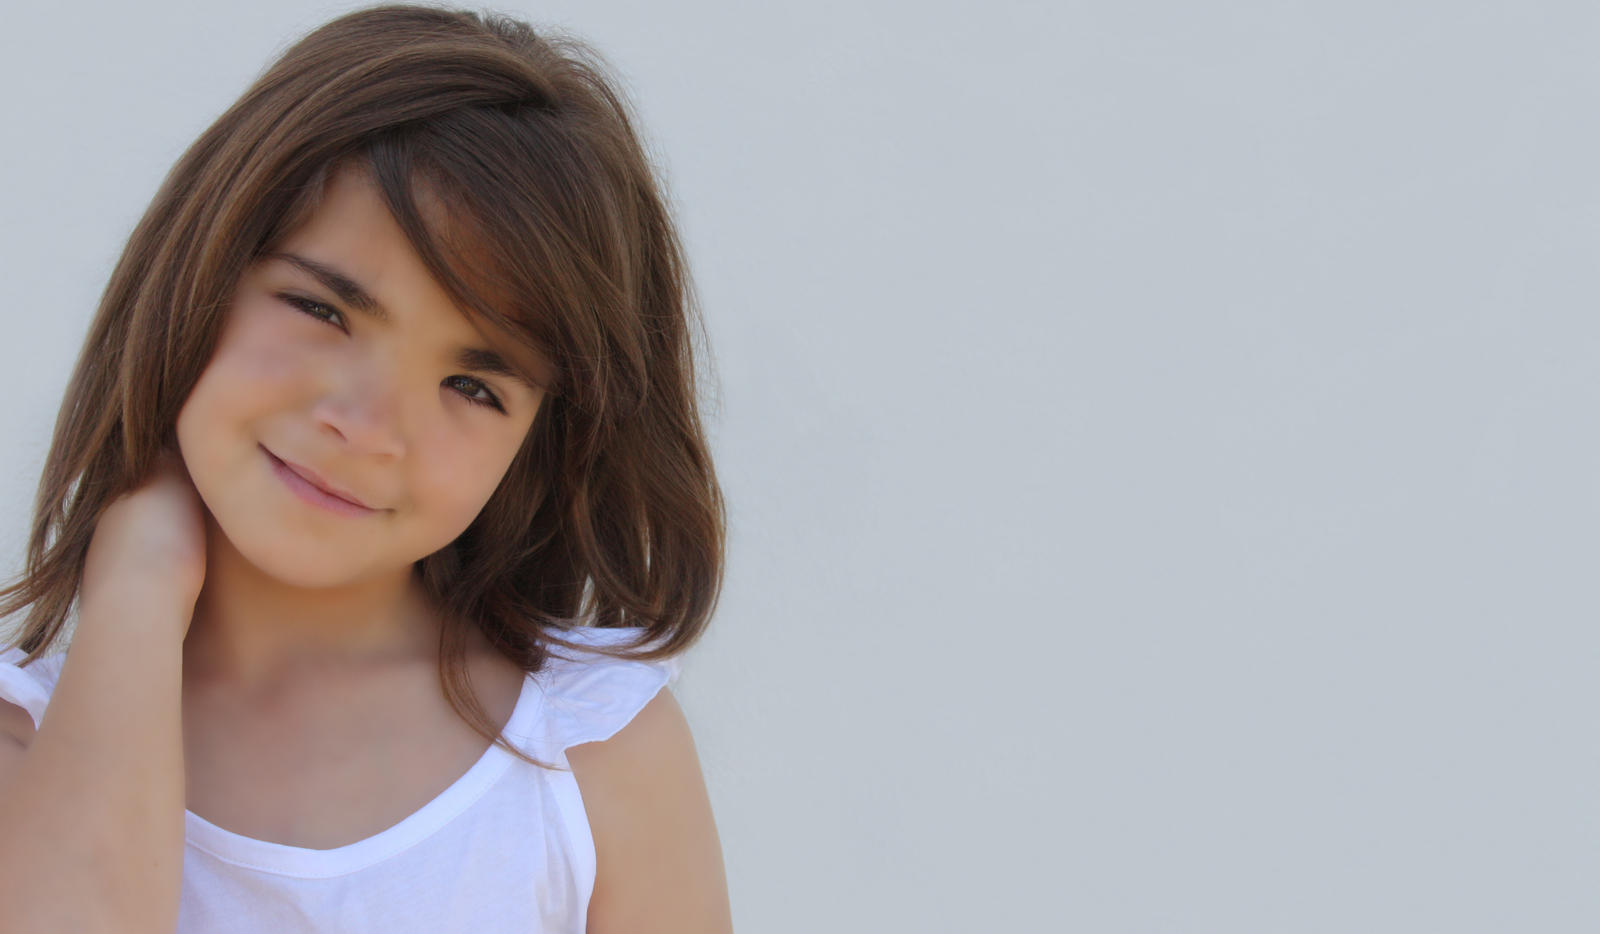 Amelie TotalSuperCuties Layla Rose Leila FTV - 5